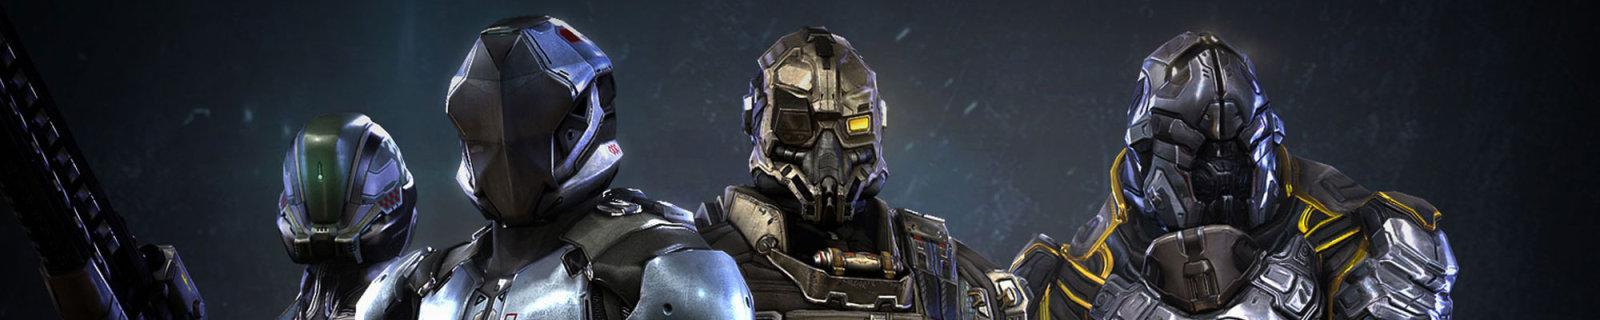 CCP宣布《Dust 514》PS3版将在五月份停服